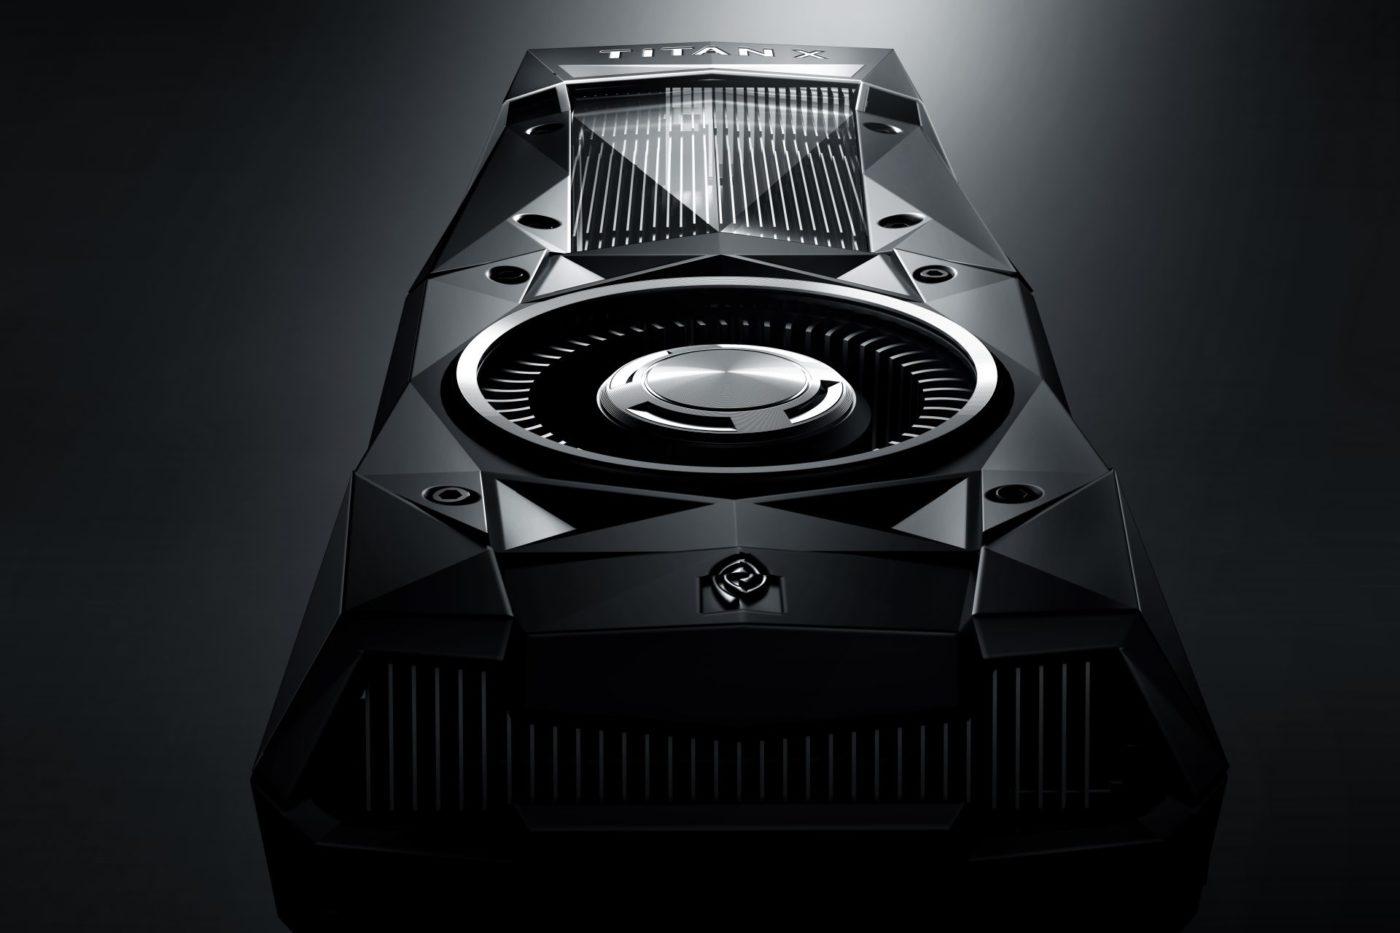 Nvidia's Revealing The GTX 1080 Ti Next Week, 1070 Ti Anyone? 1